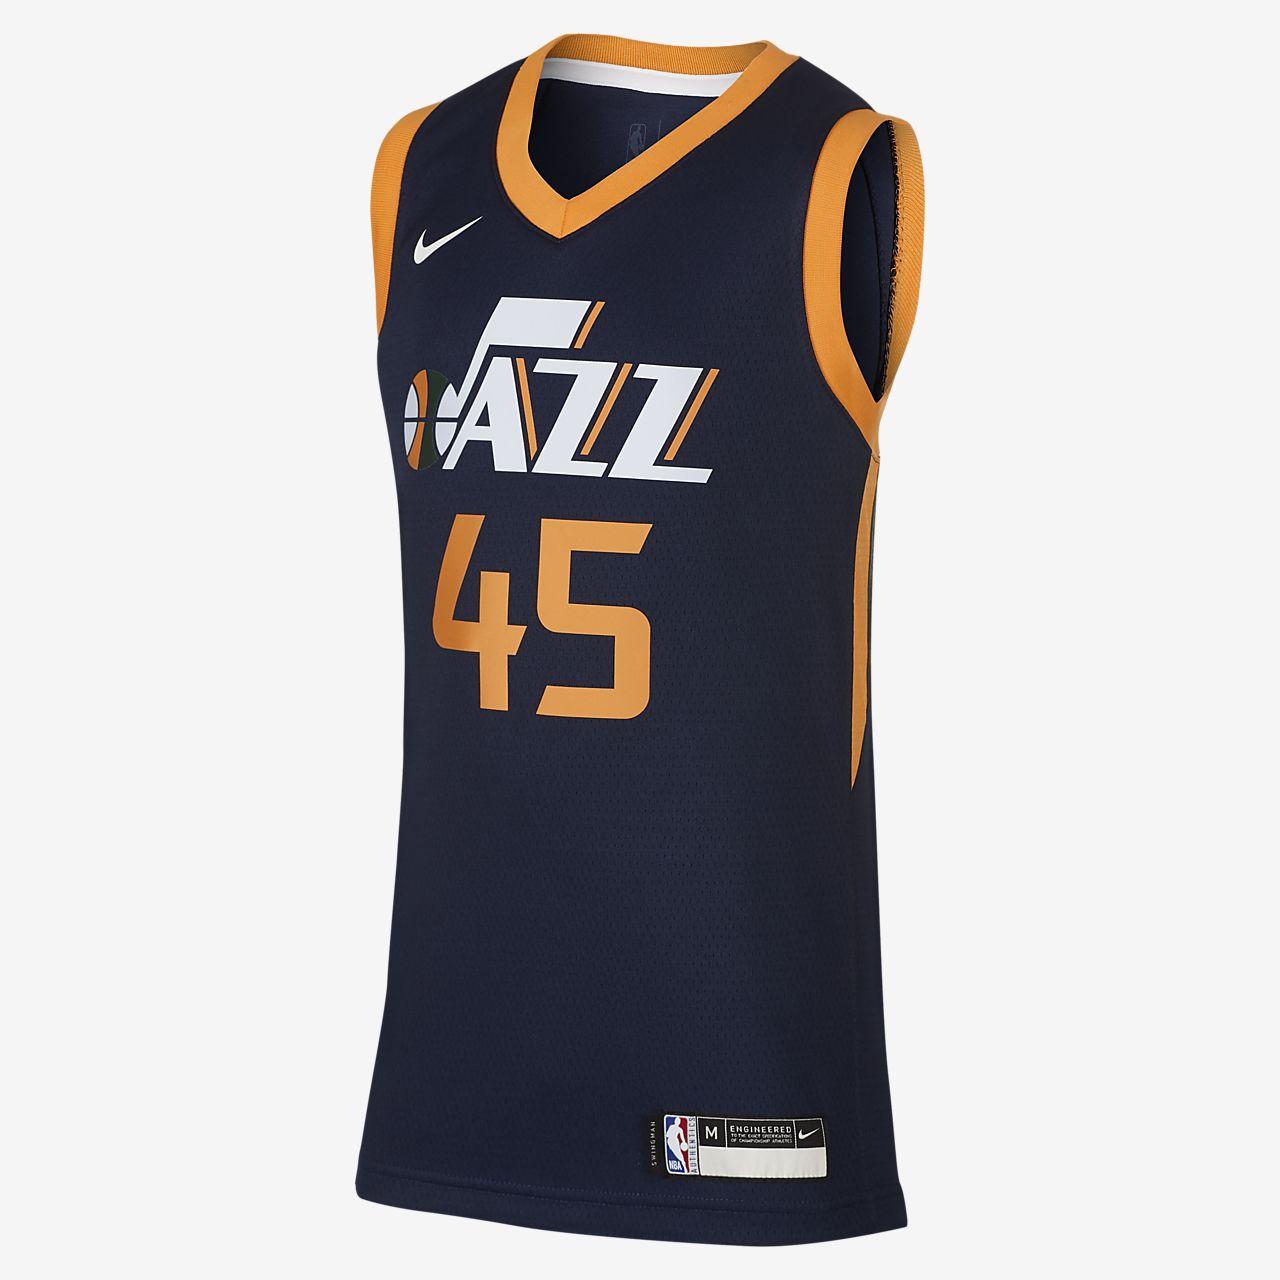 犹他爵士队 Icon Edition Swingman Nike NBA Jersey大童(男孩)球衣